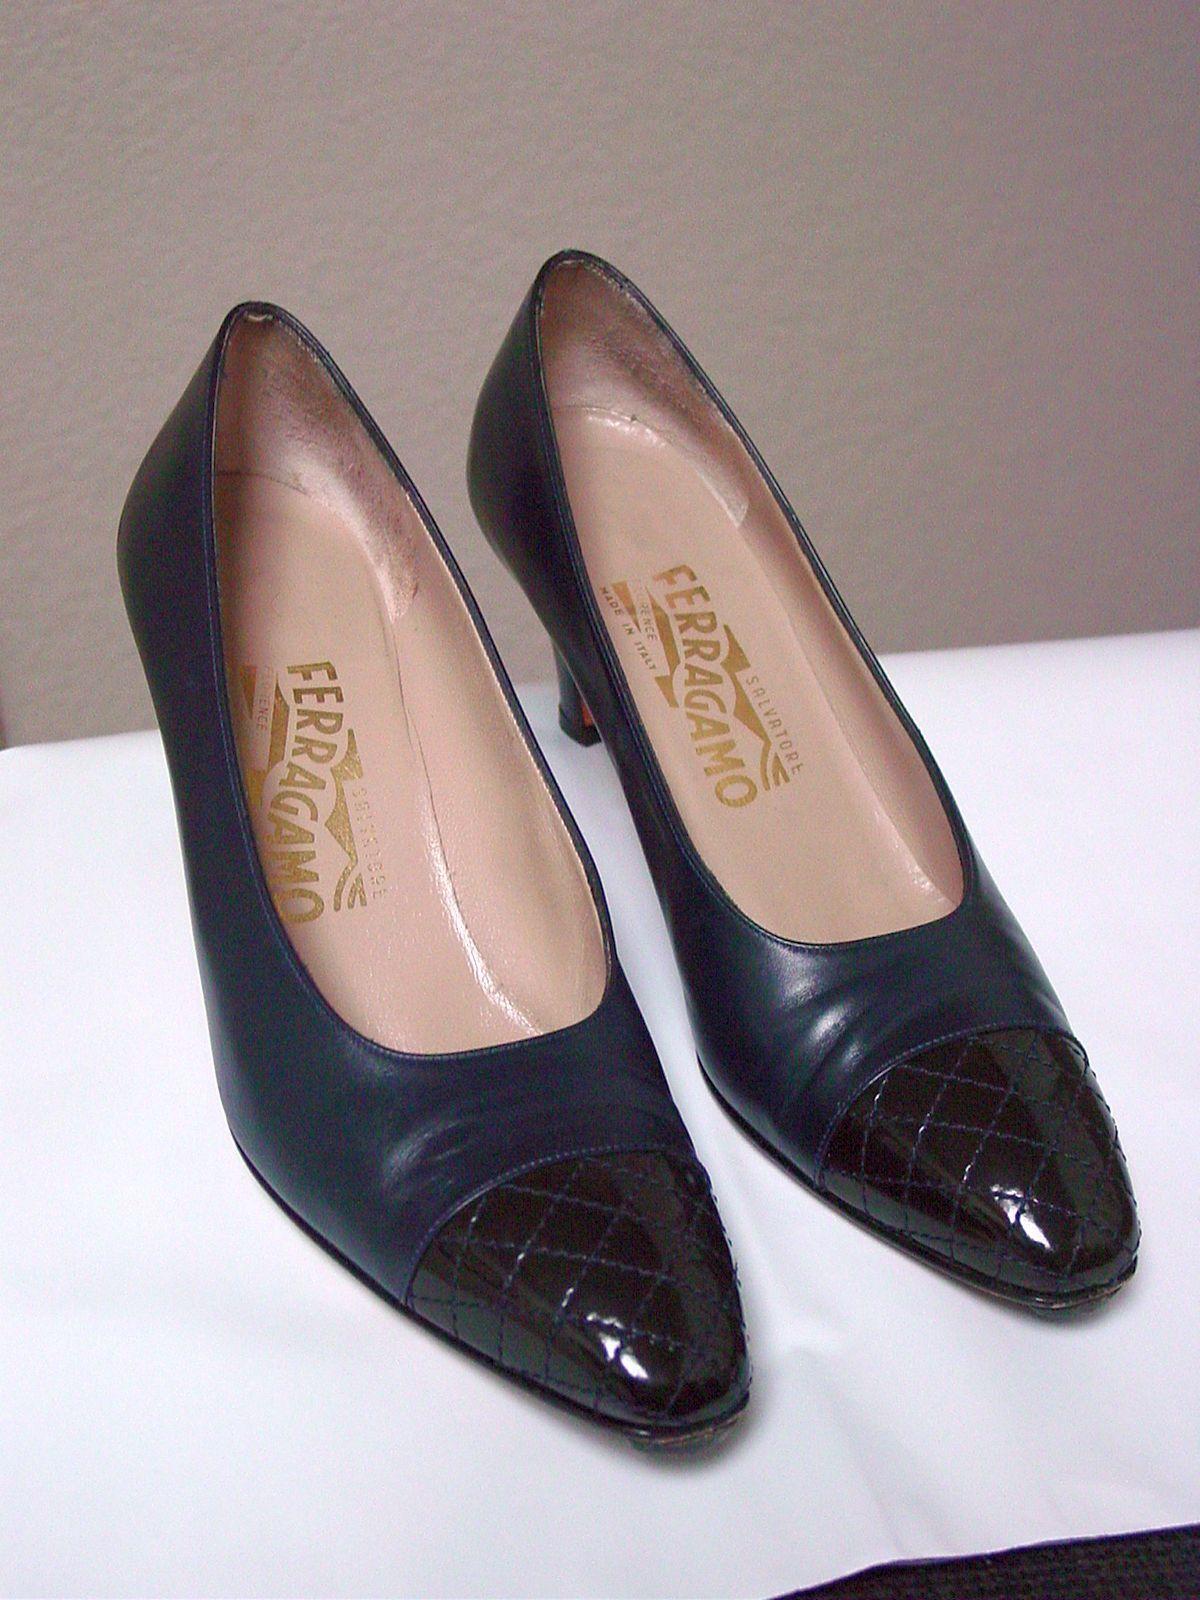 damen Salvatore Ferragamo Ferragamo Ferragamo Classic Heels Pumps  7 1 2 AAA schuhe Quilt Toe 06f4b4